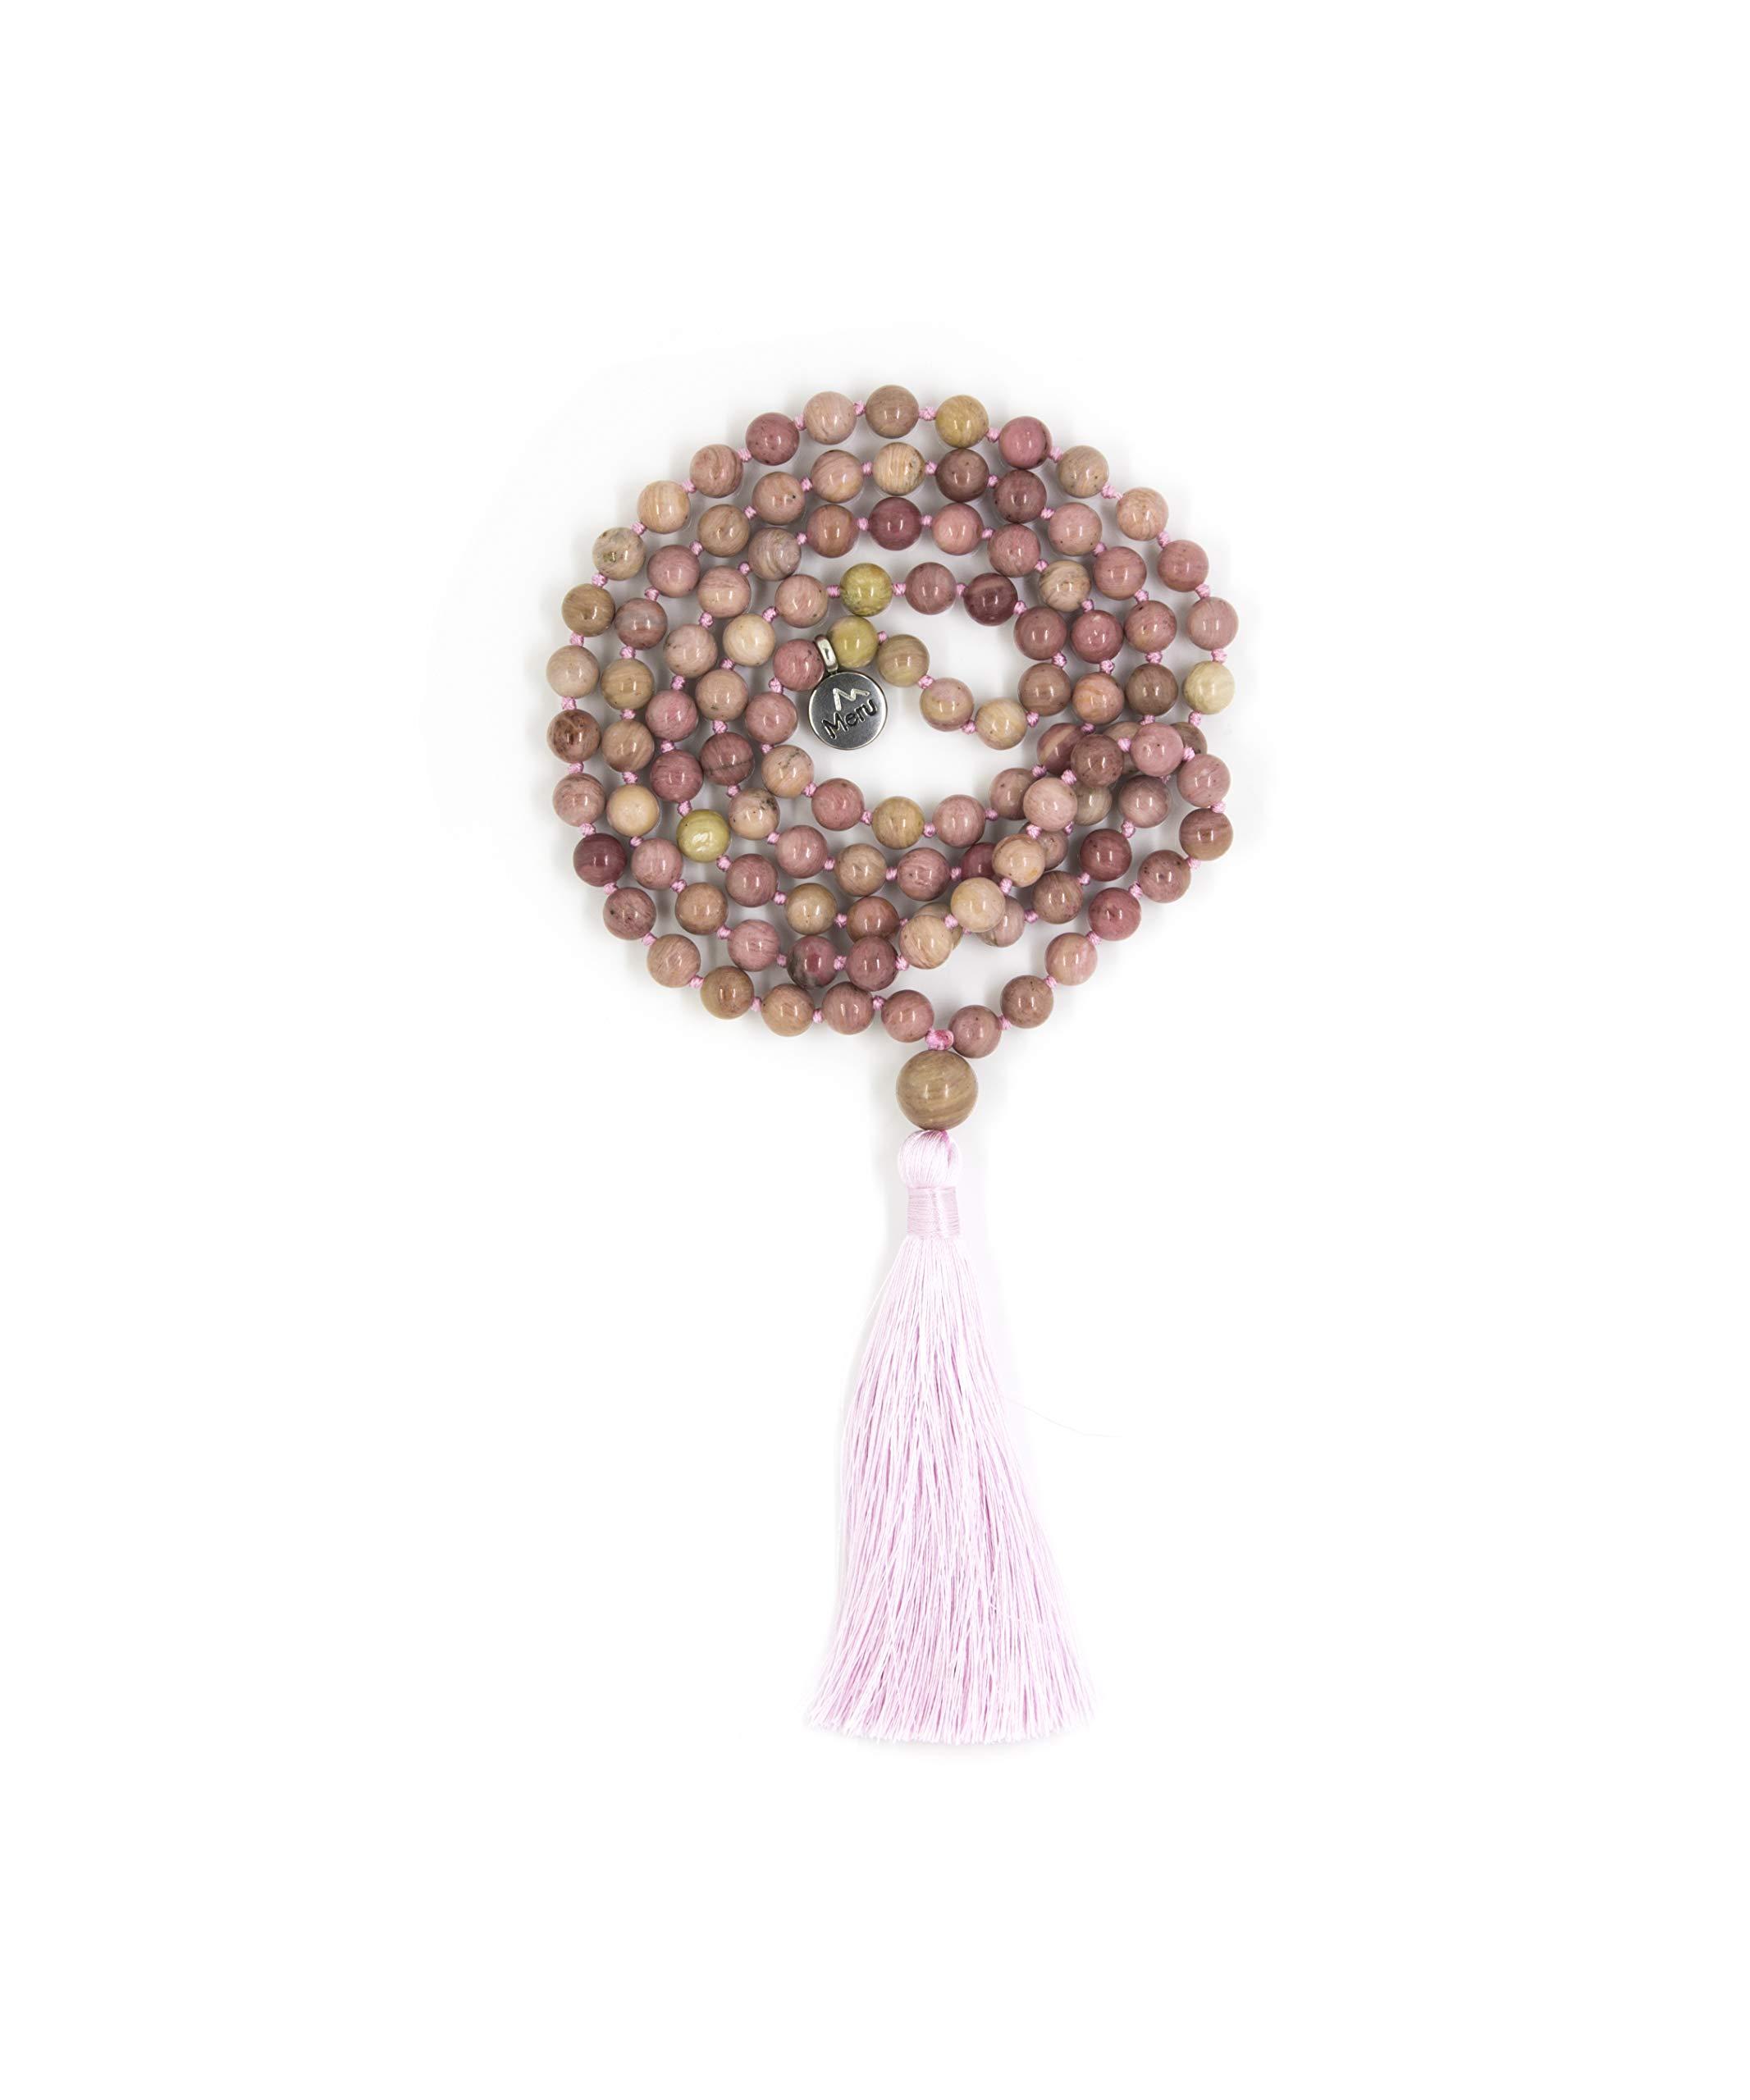 Premium Mala Beads Necklace - Mala Necklace - Japa Mala - Japa Neklace - Tassel Necklace - 108 Mala Beads Meditation